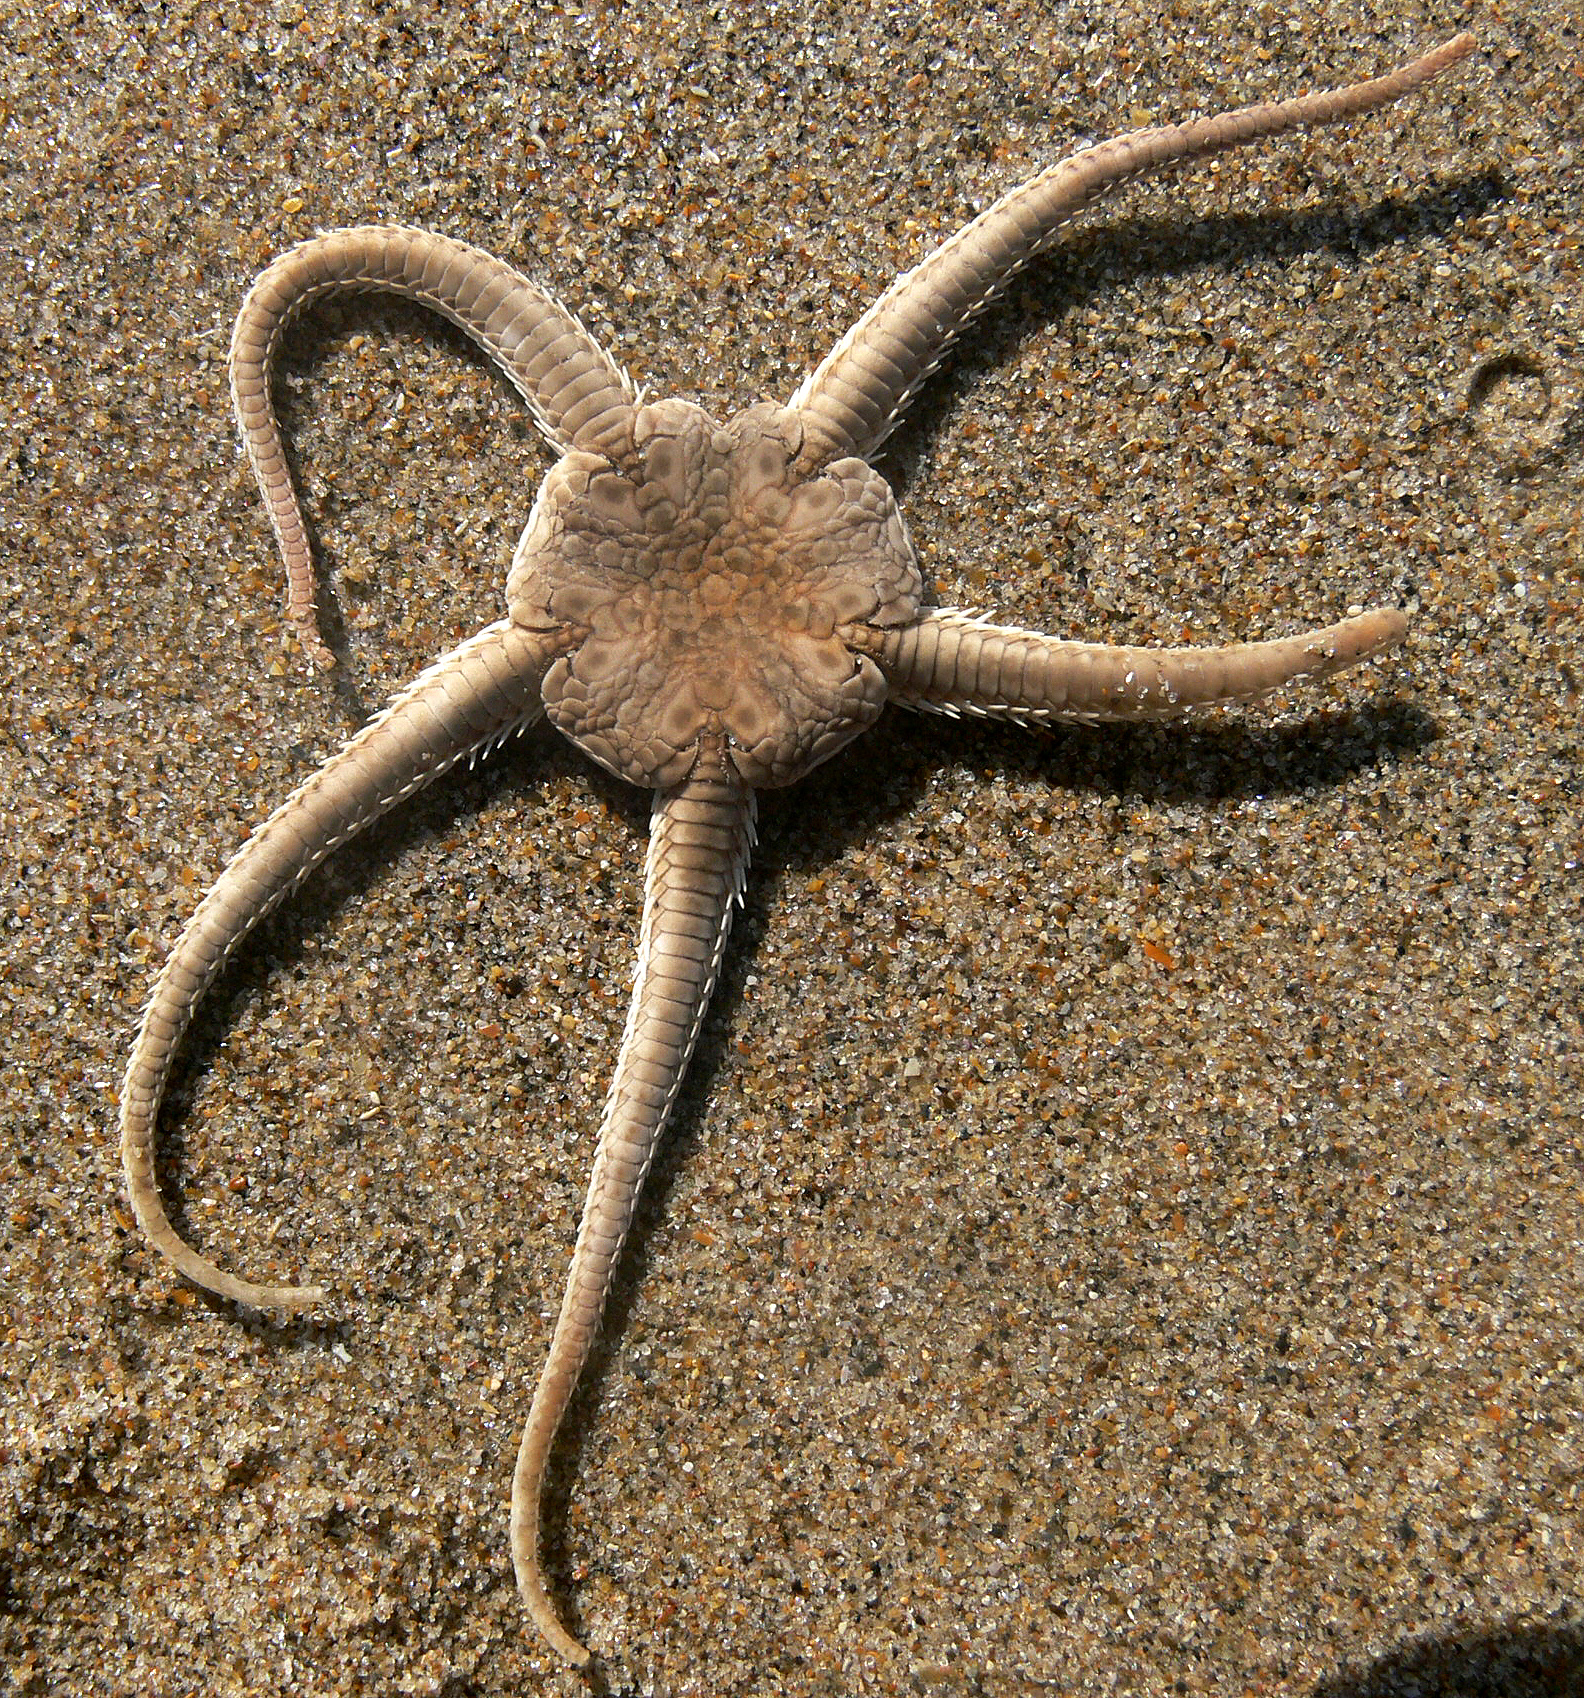 Drawn starfish saltwater fish Wikipedia star ophiura Brittle an